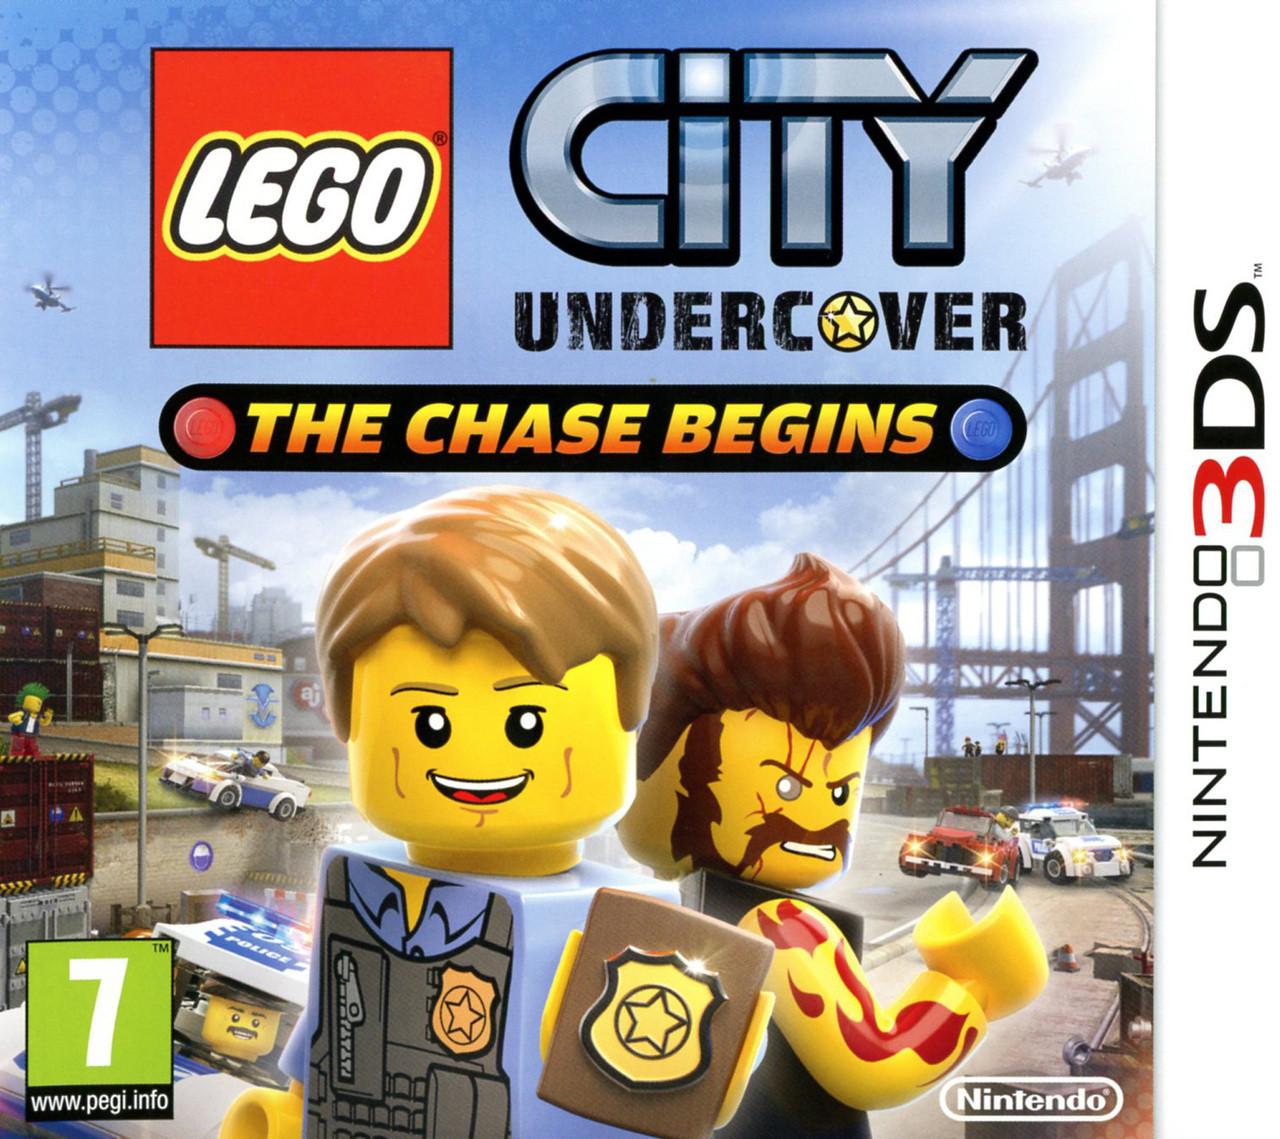 jeux video lego city